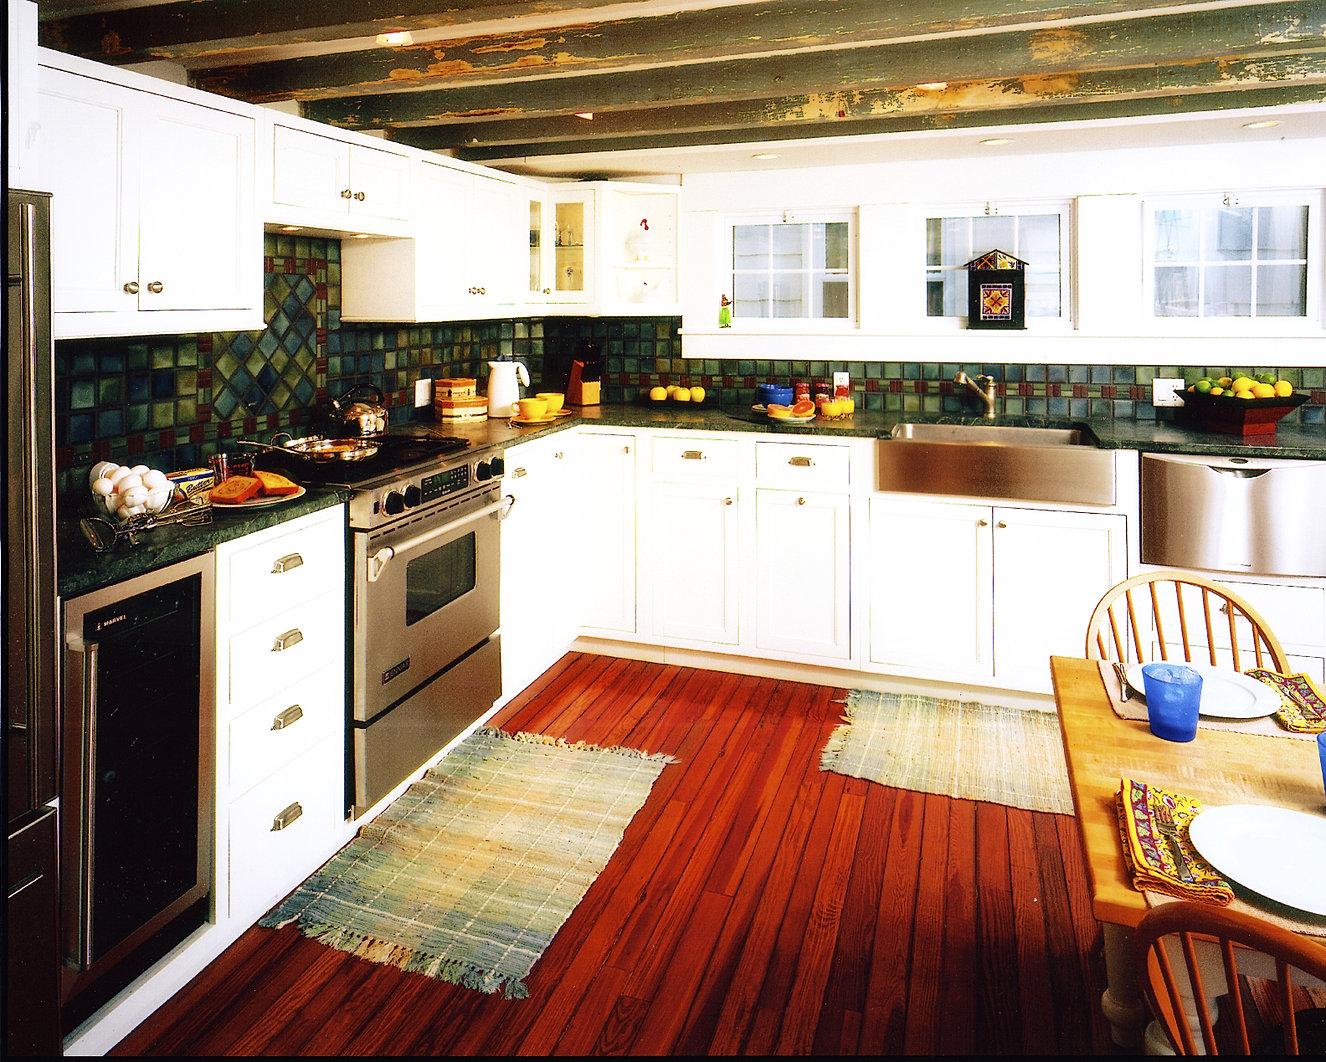 Kitchen cabinets summit nj - Kitchen Contractors Summit Nj